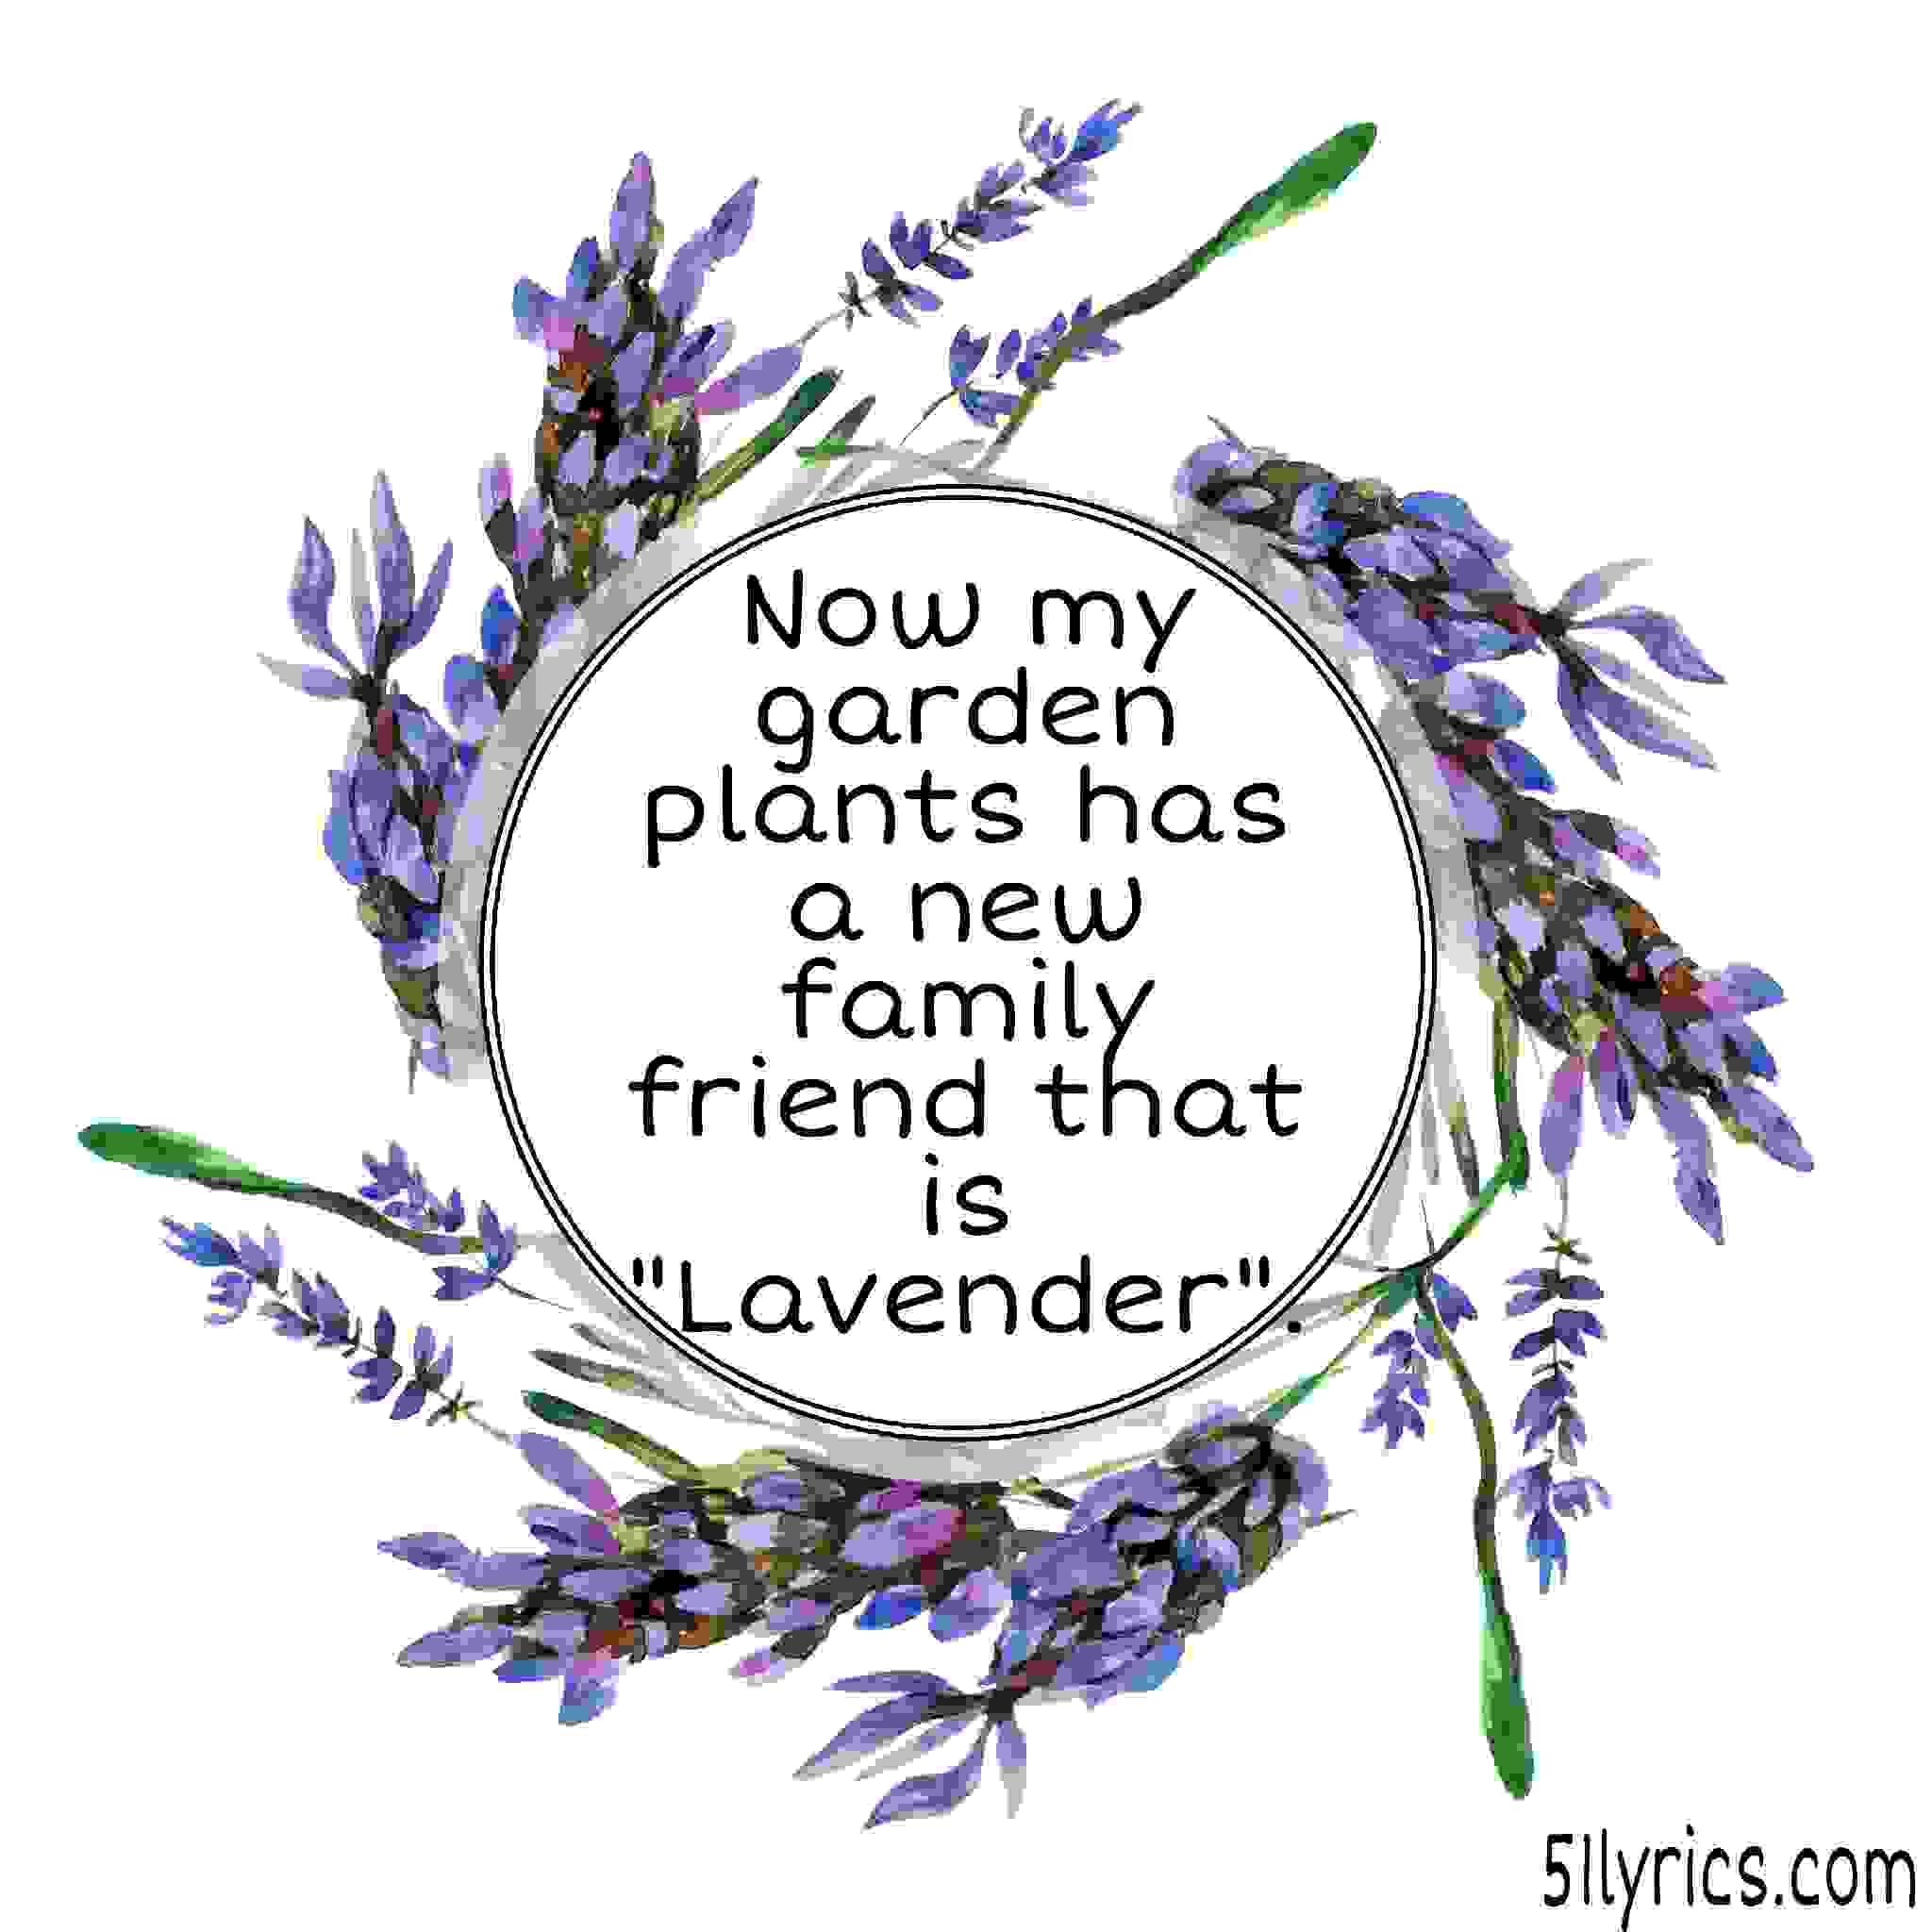 Lavender captions for Instagram,  lavender quotes, lavender funny quotes